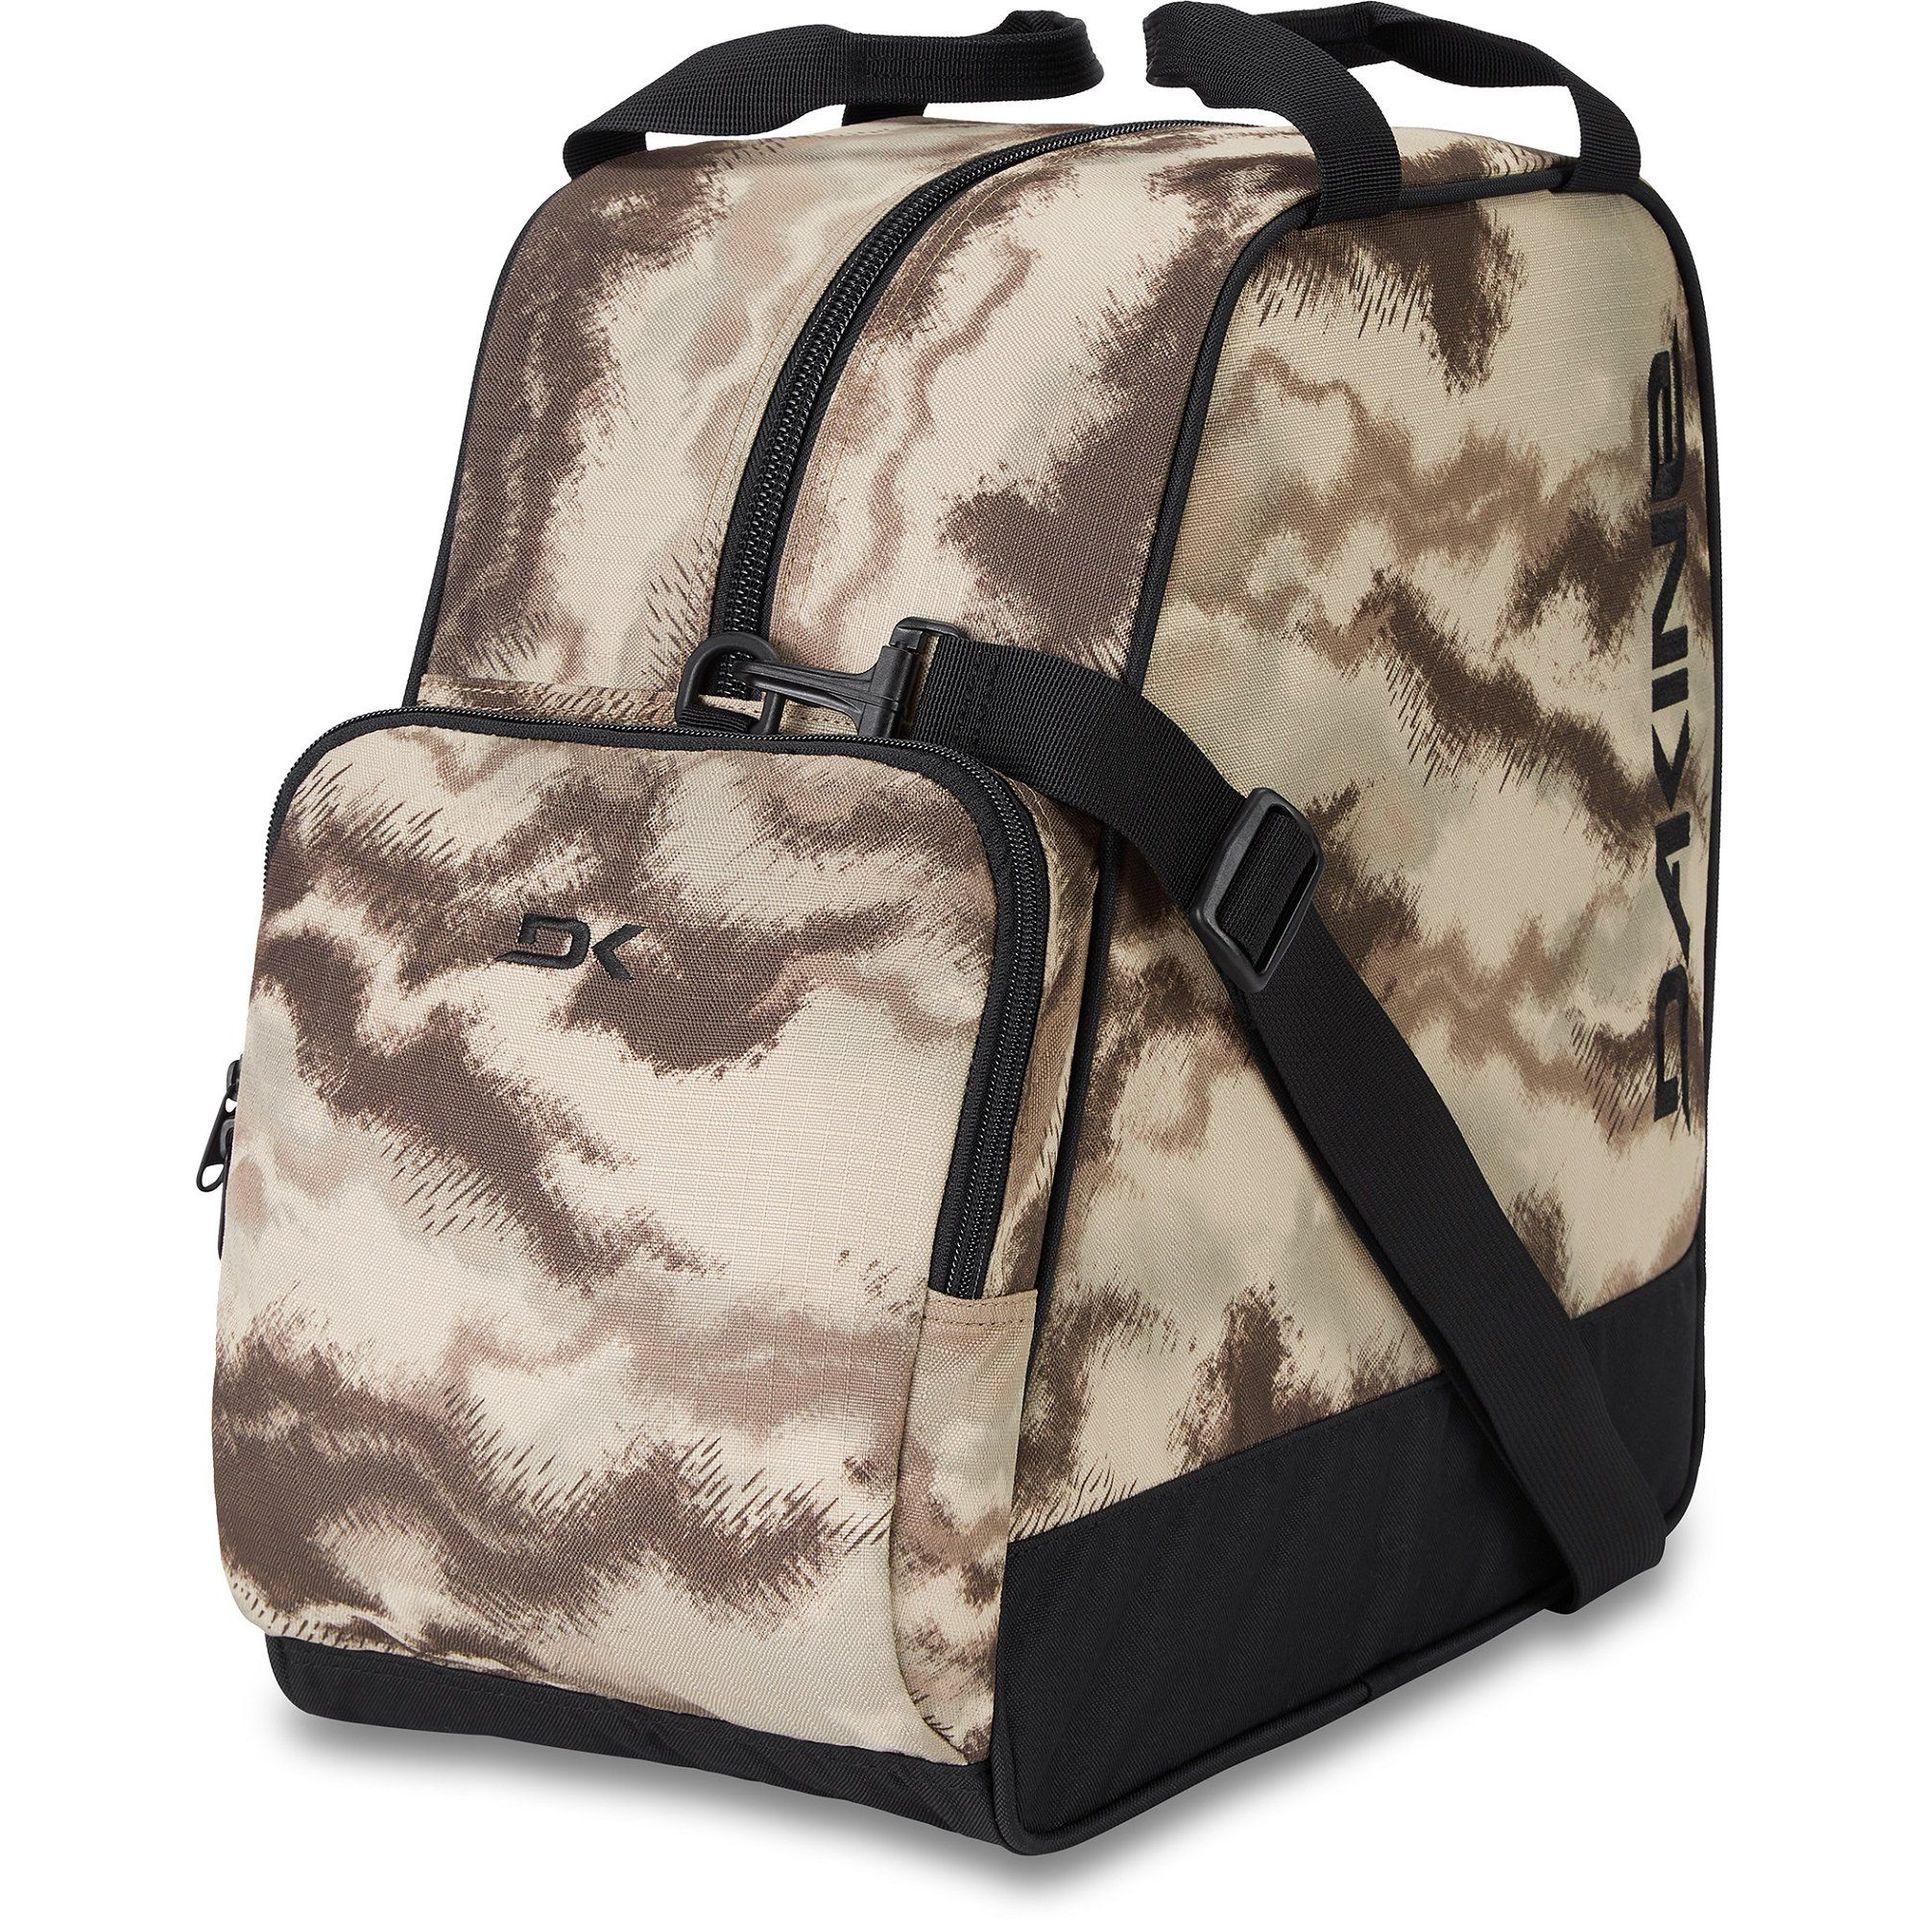 TORBA NA BUTY DAKINE BOOT BAG 30L ASHCROFT CAMO